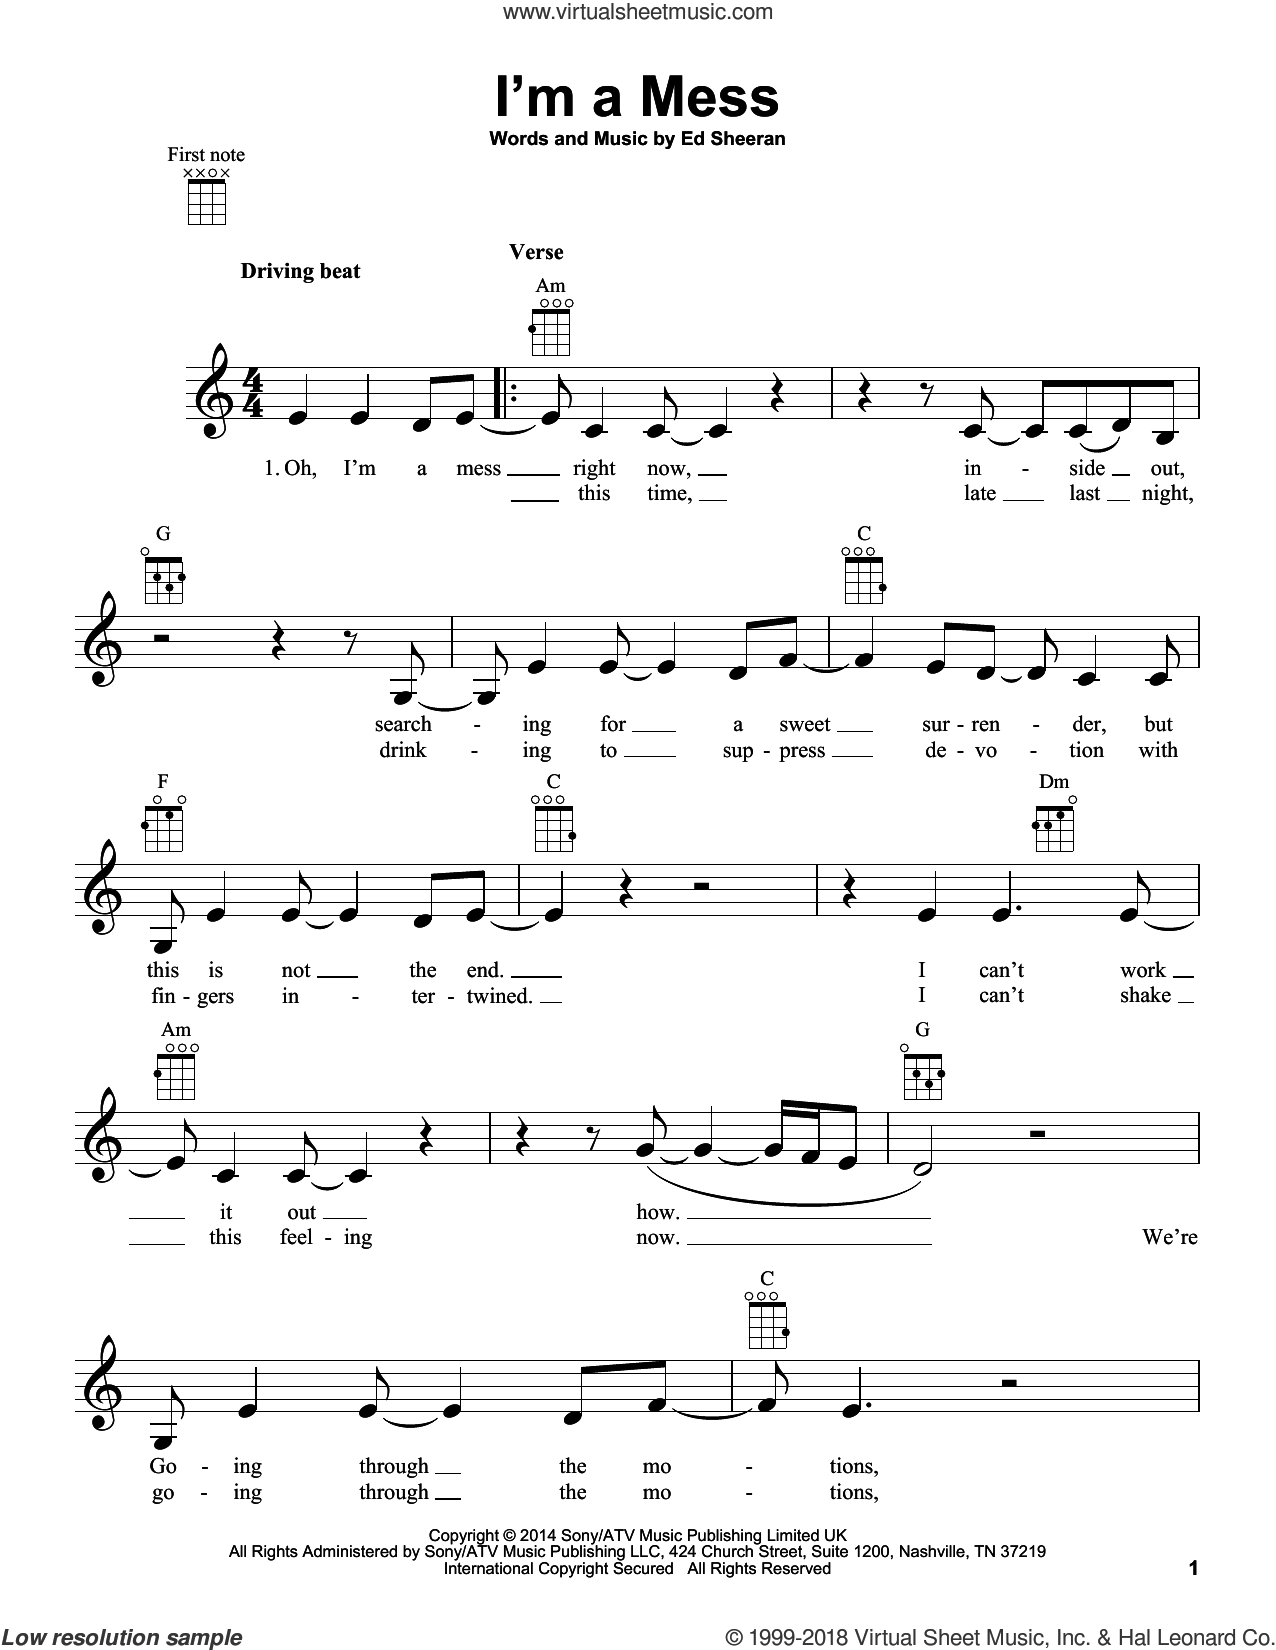 I'm A Mess sheet music for ukulele by Ed Sheeran, intermediate skill level